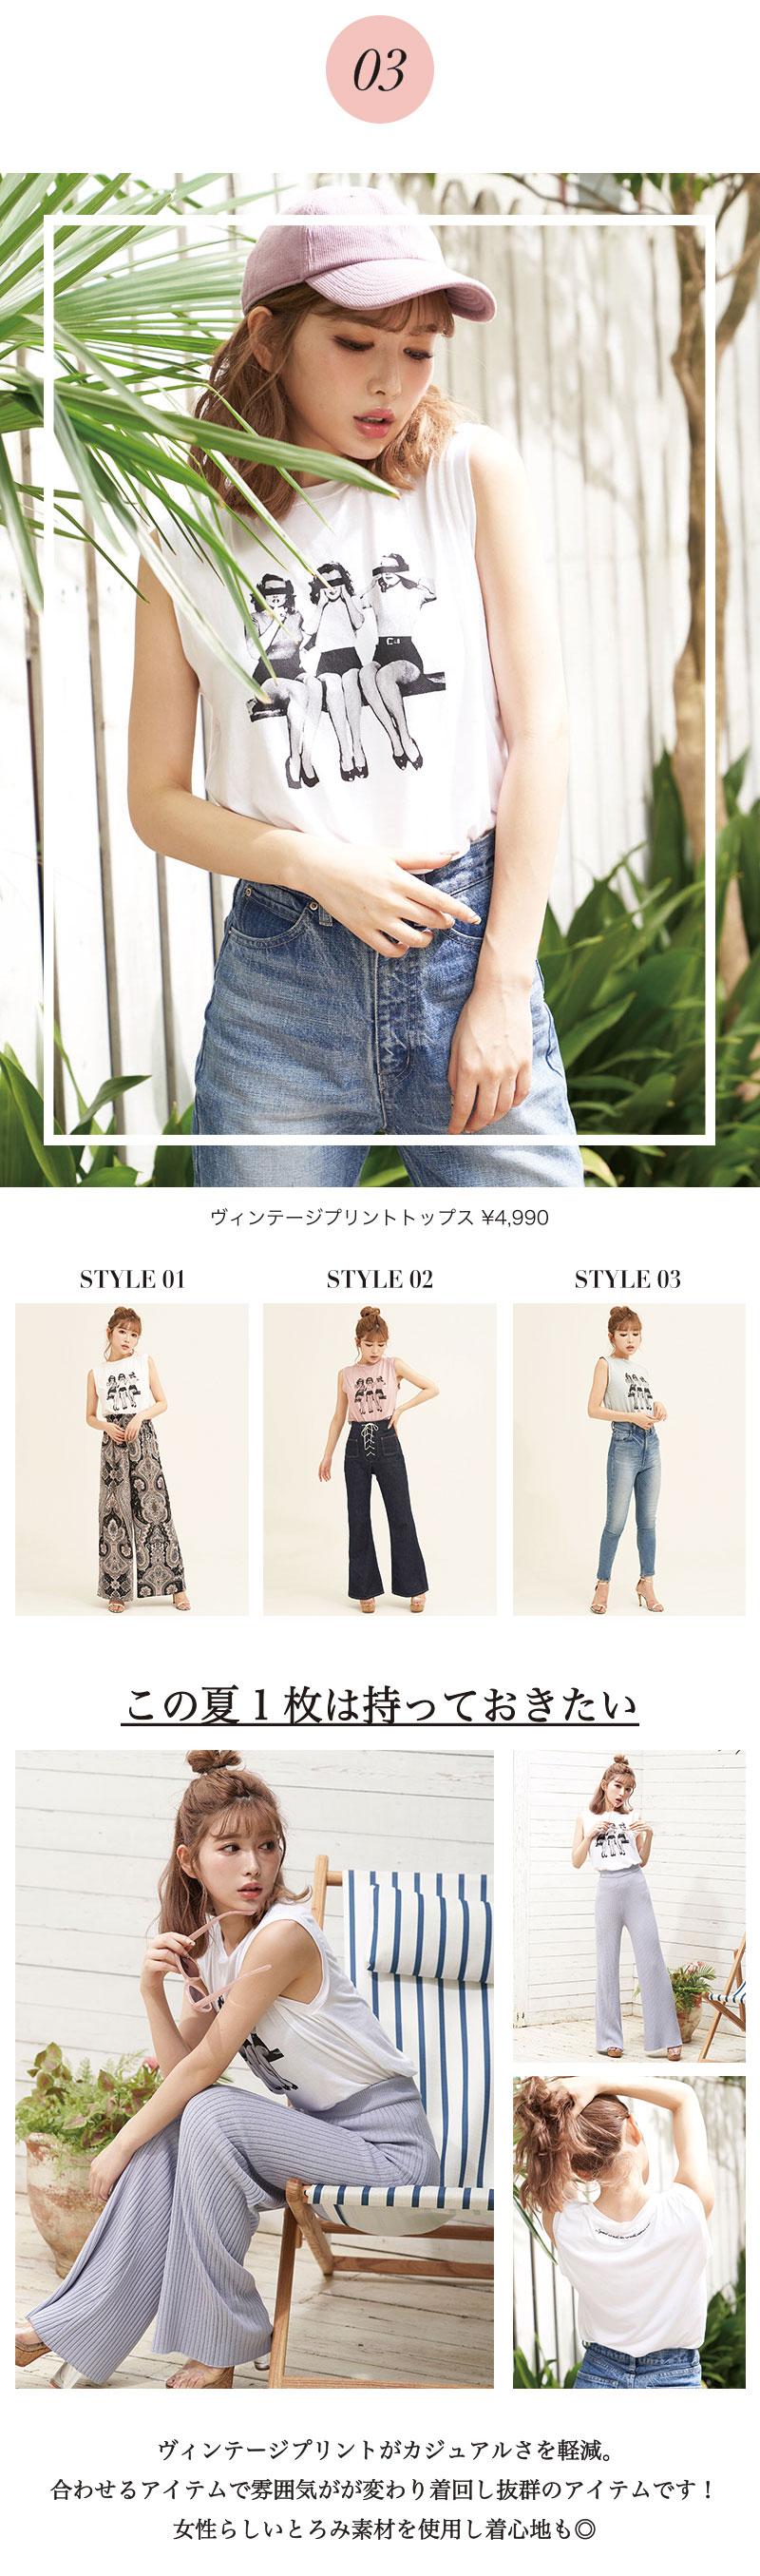 18SS トップスコレクション特集5